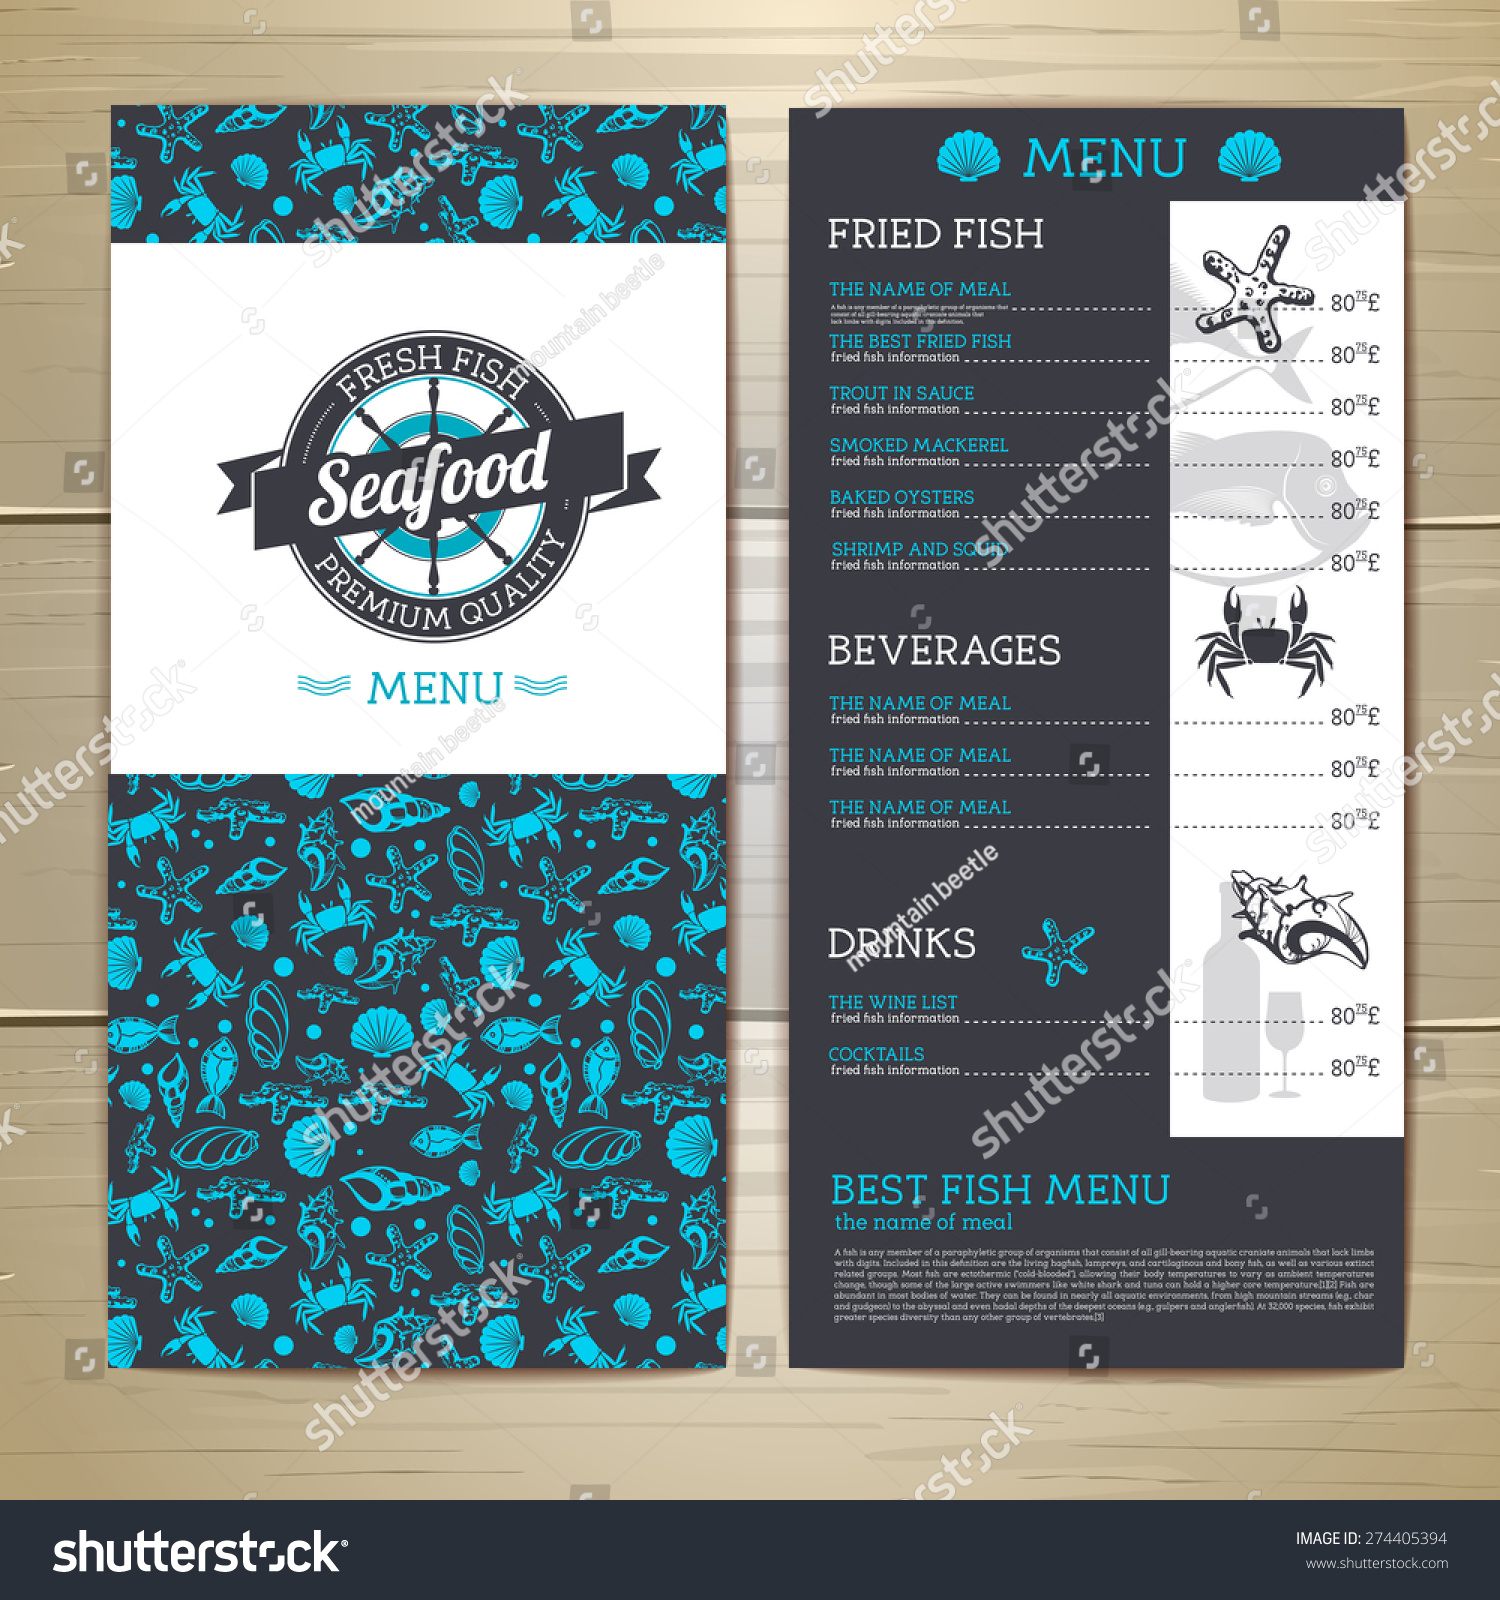 Seafood Cafe Menu Design Document Template Stock Vector (Royalty ...